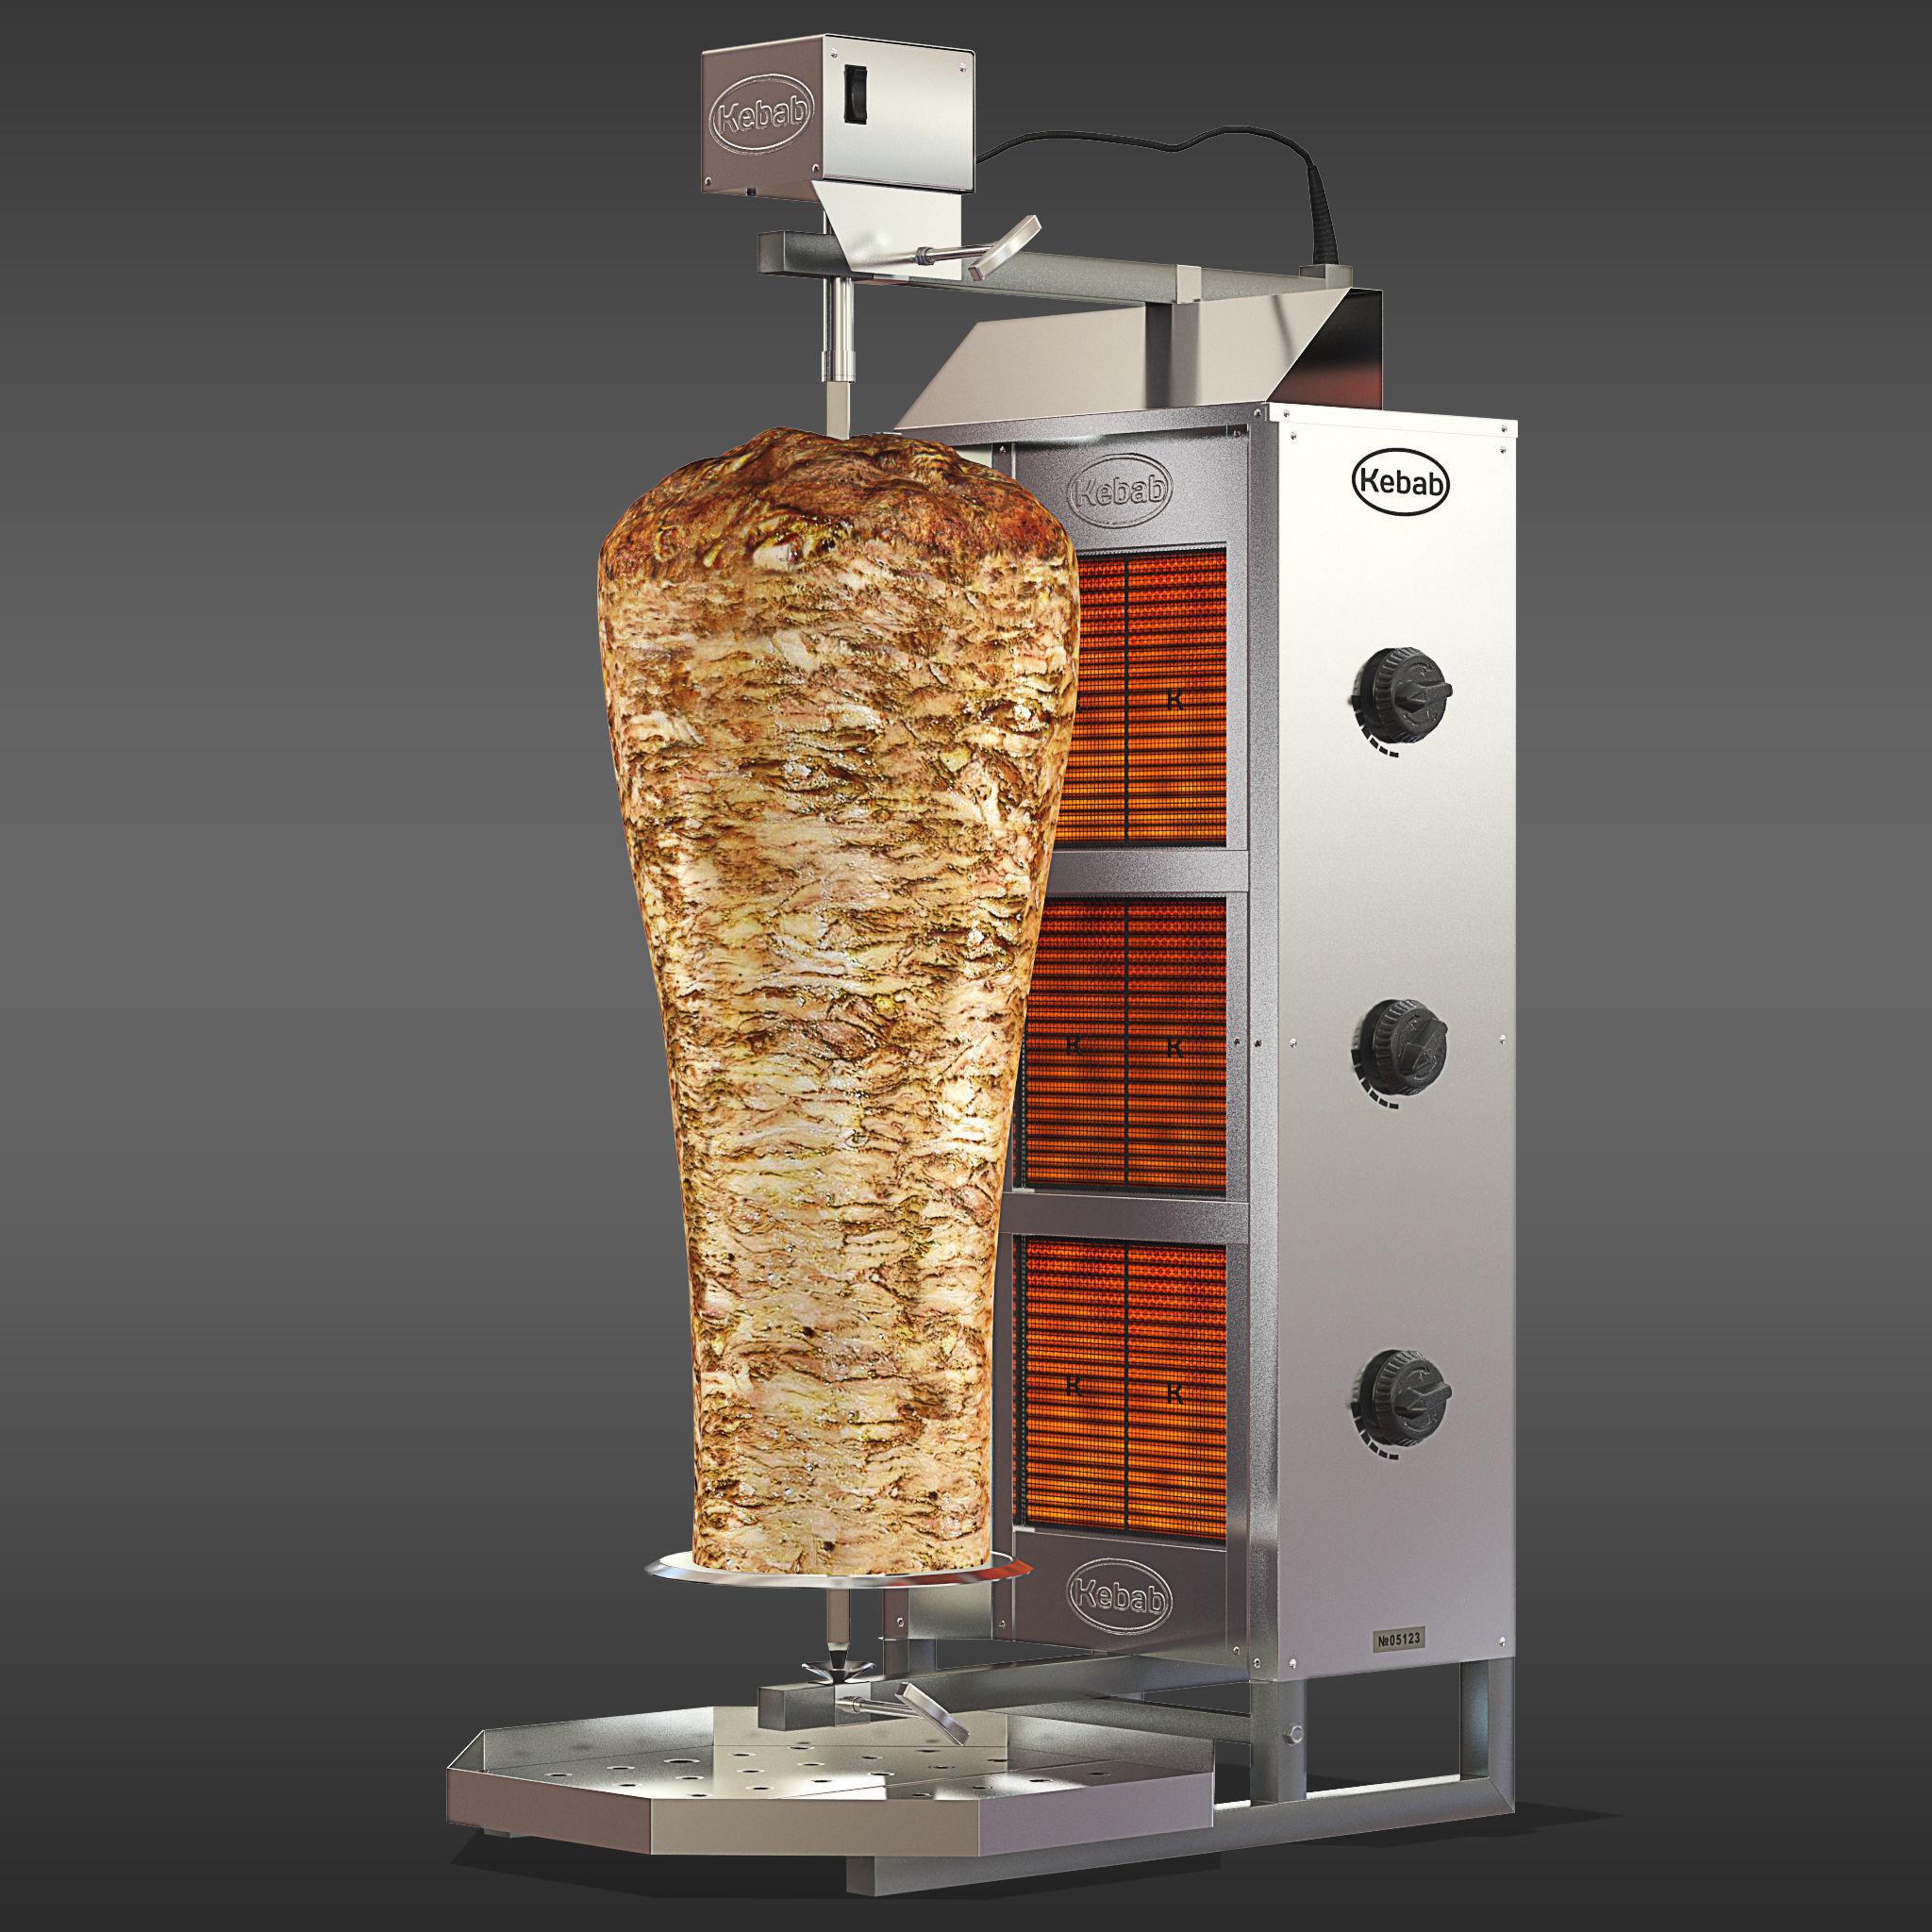 Kebab machine model